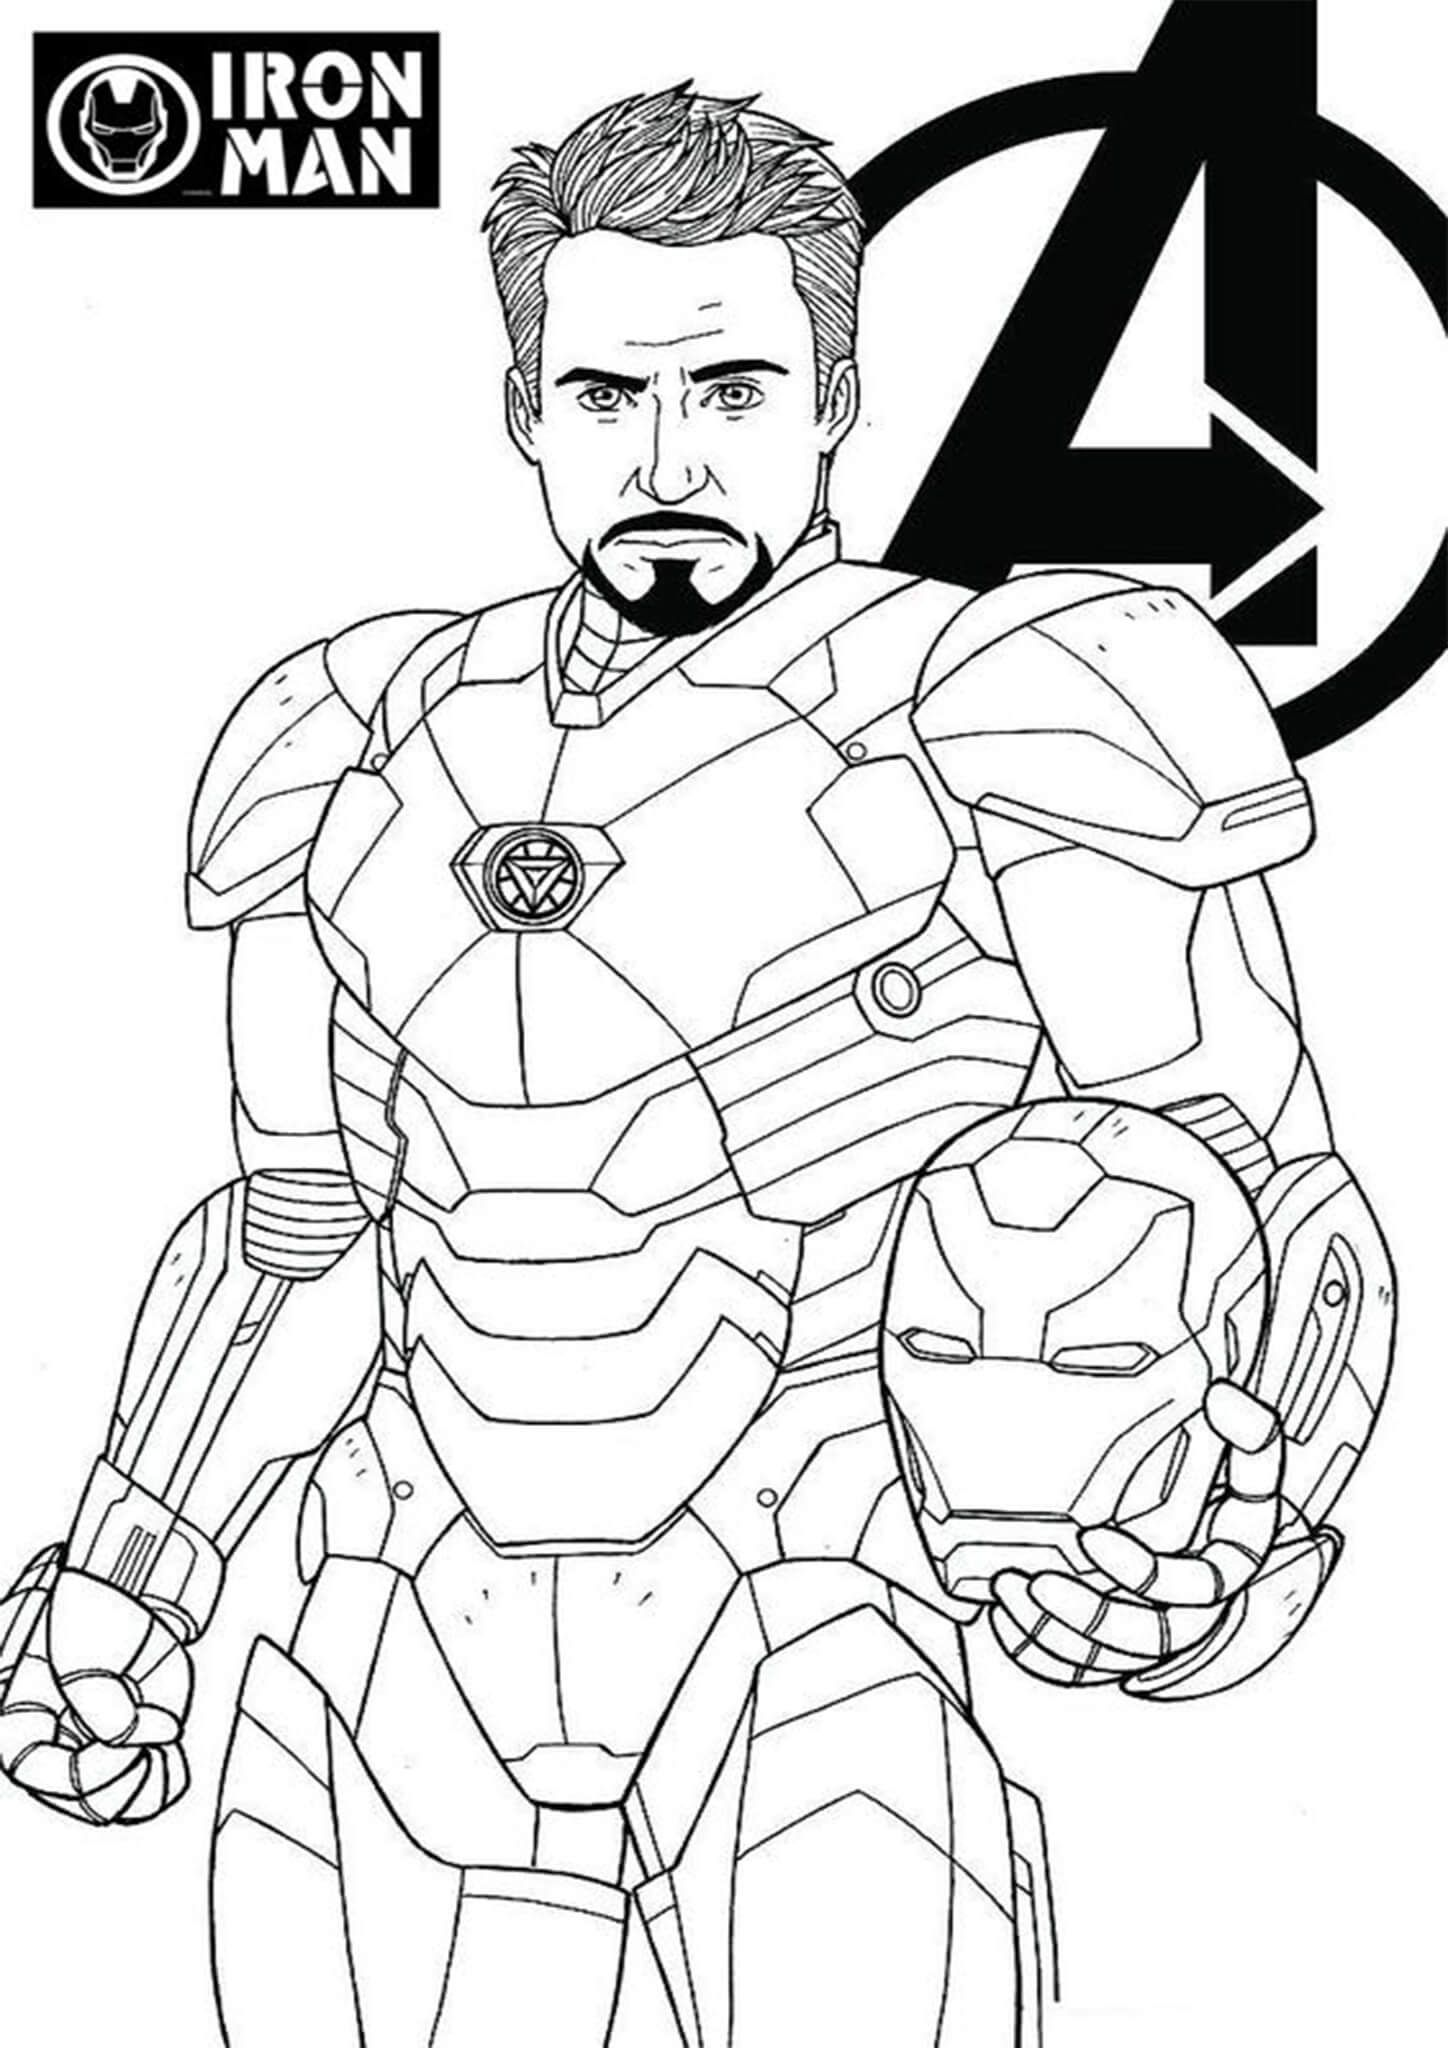 Free Easy To Print Iron Man Coloring Pages Superhelden Malvorlagen Iron Man Cartoon Wenn Du Mal Buch